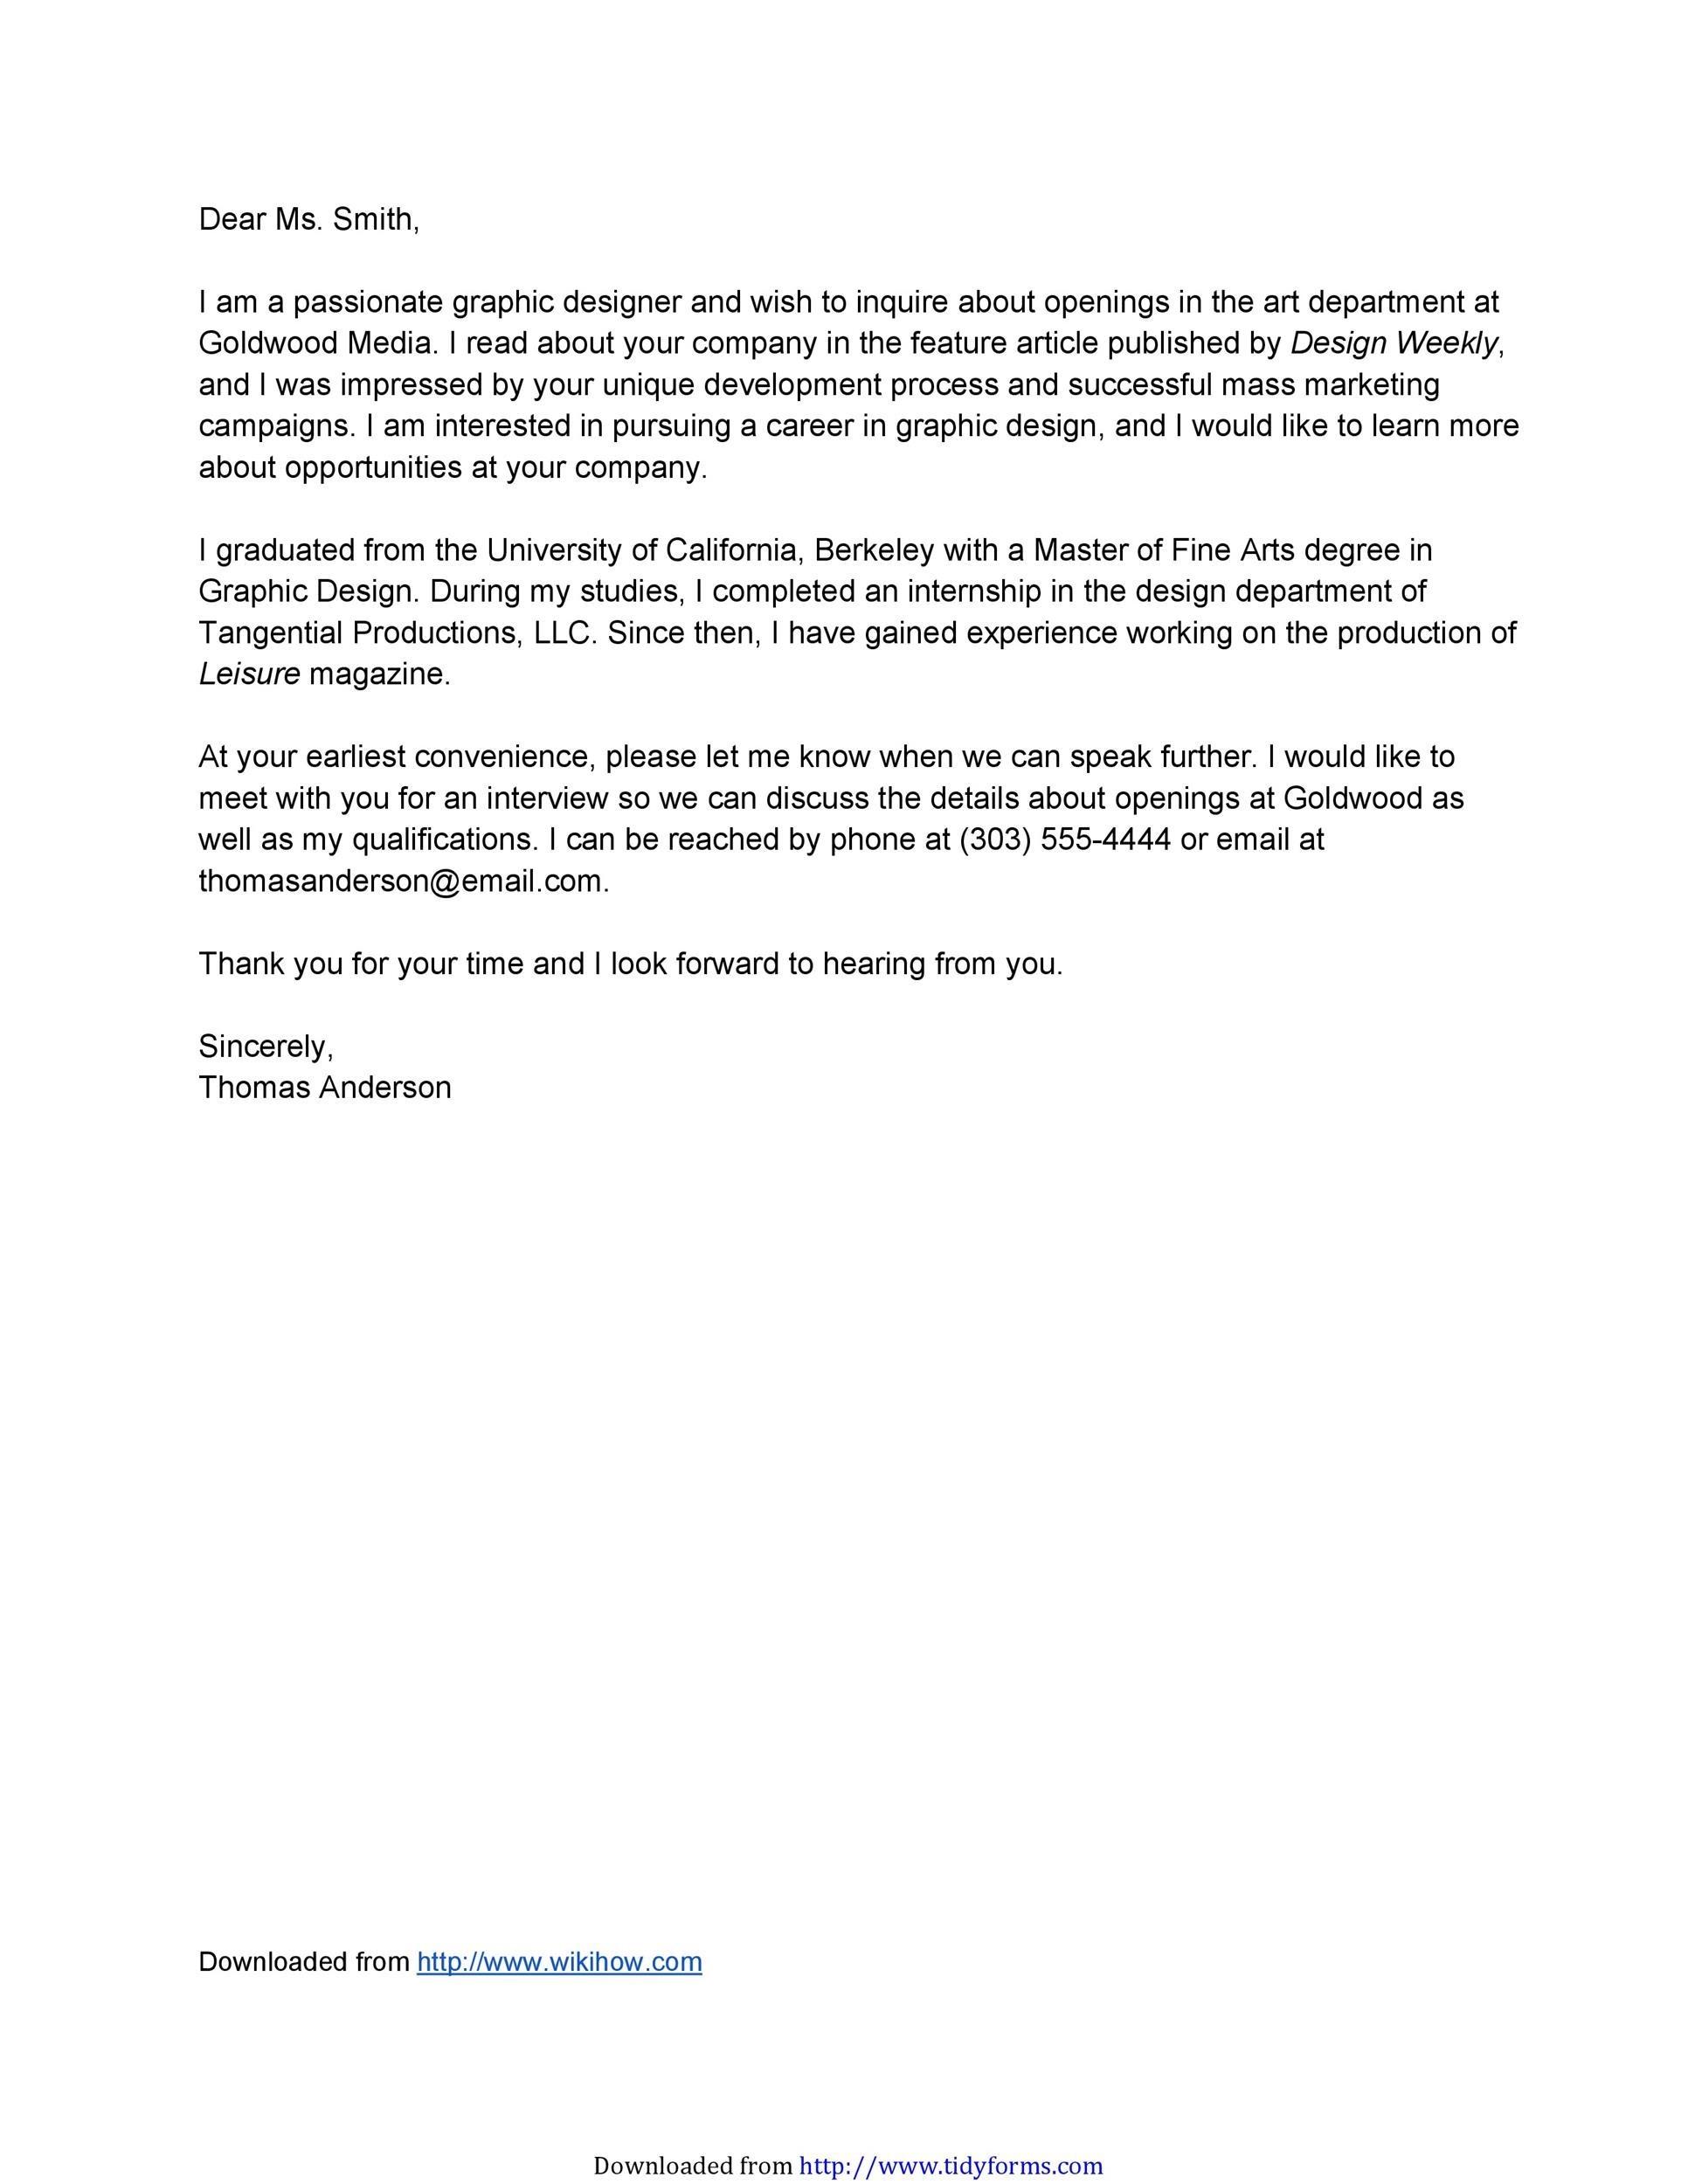 Free letter of interest 05